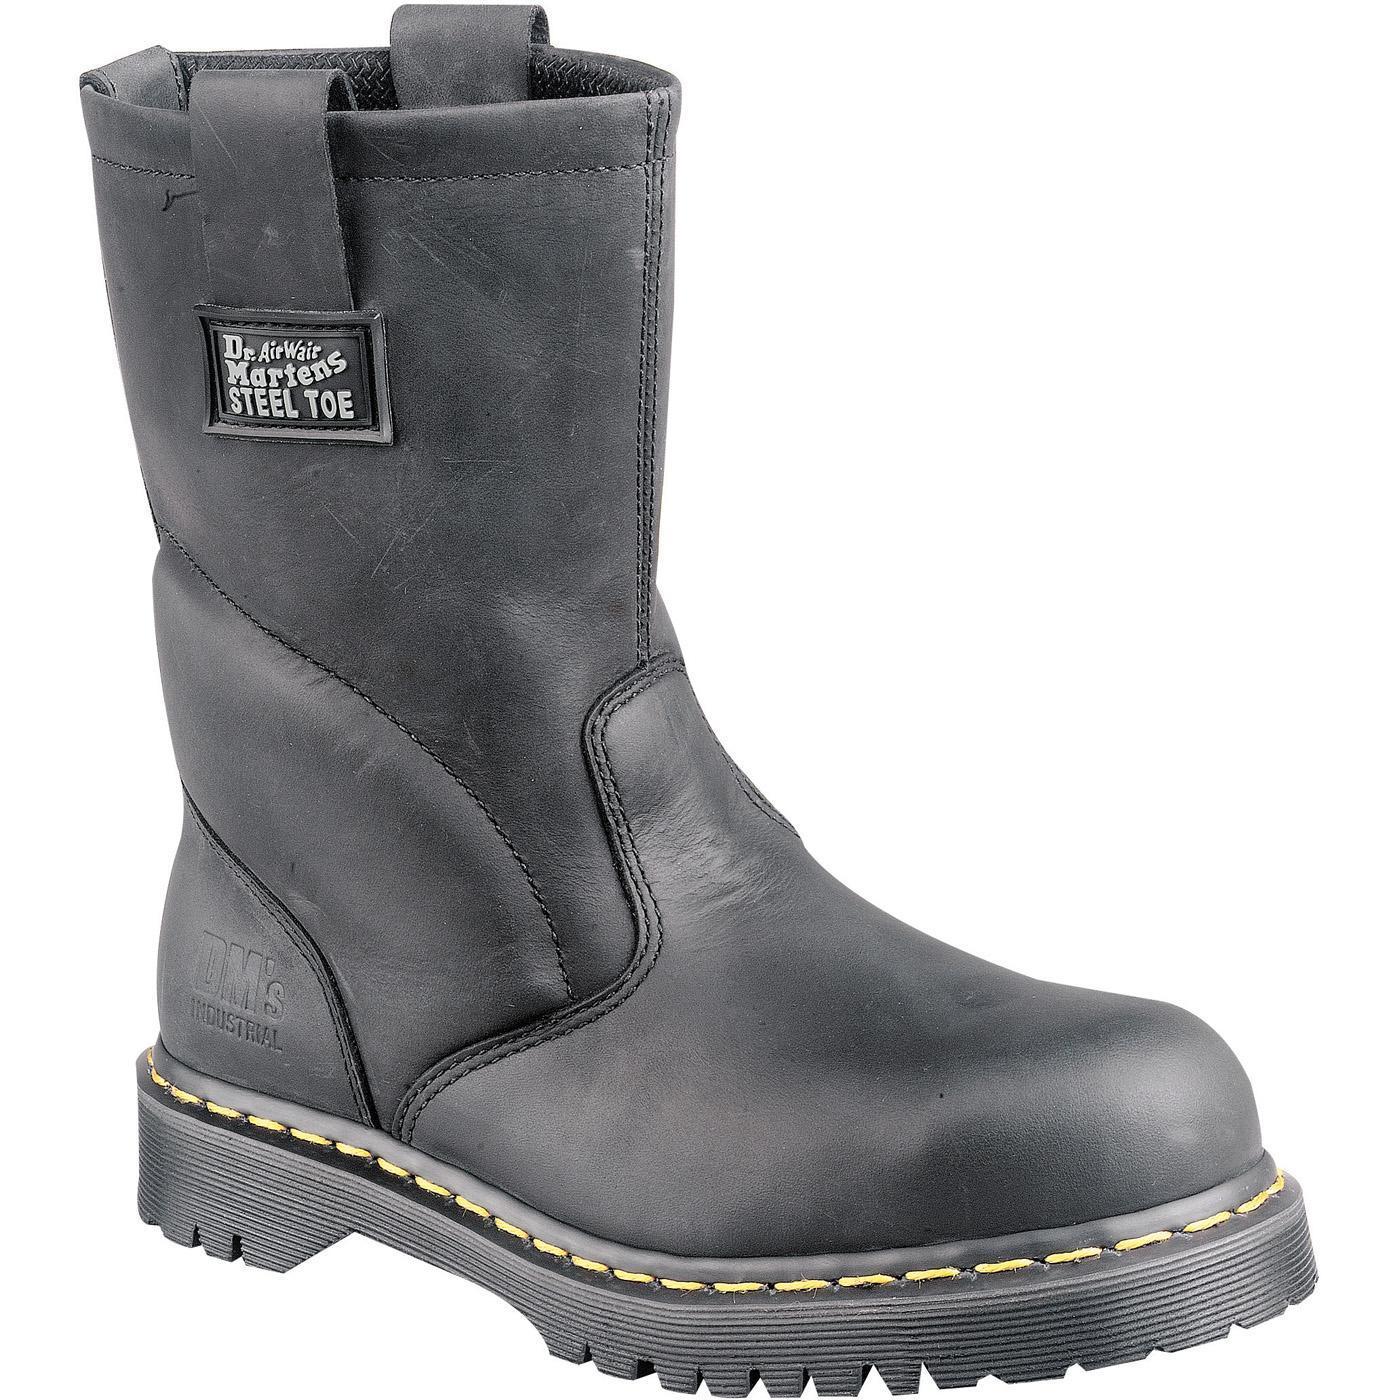 c5550f2667b Dr. Martens Icon Steel Toe Wellington Work Boot